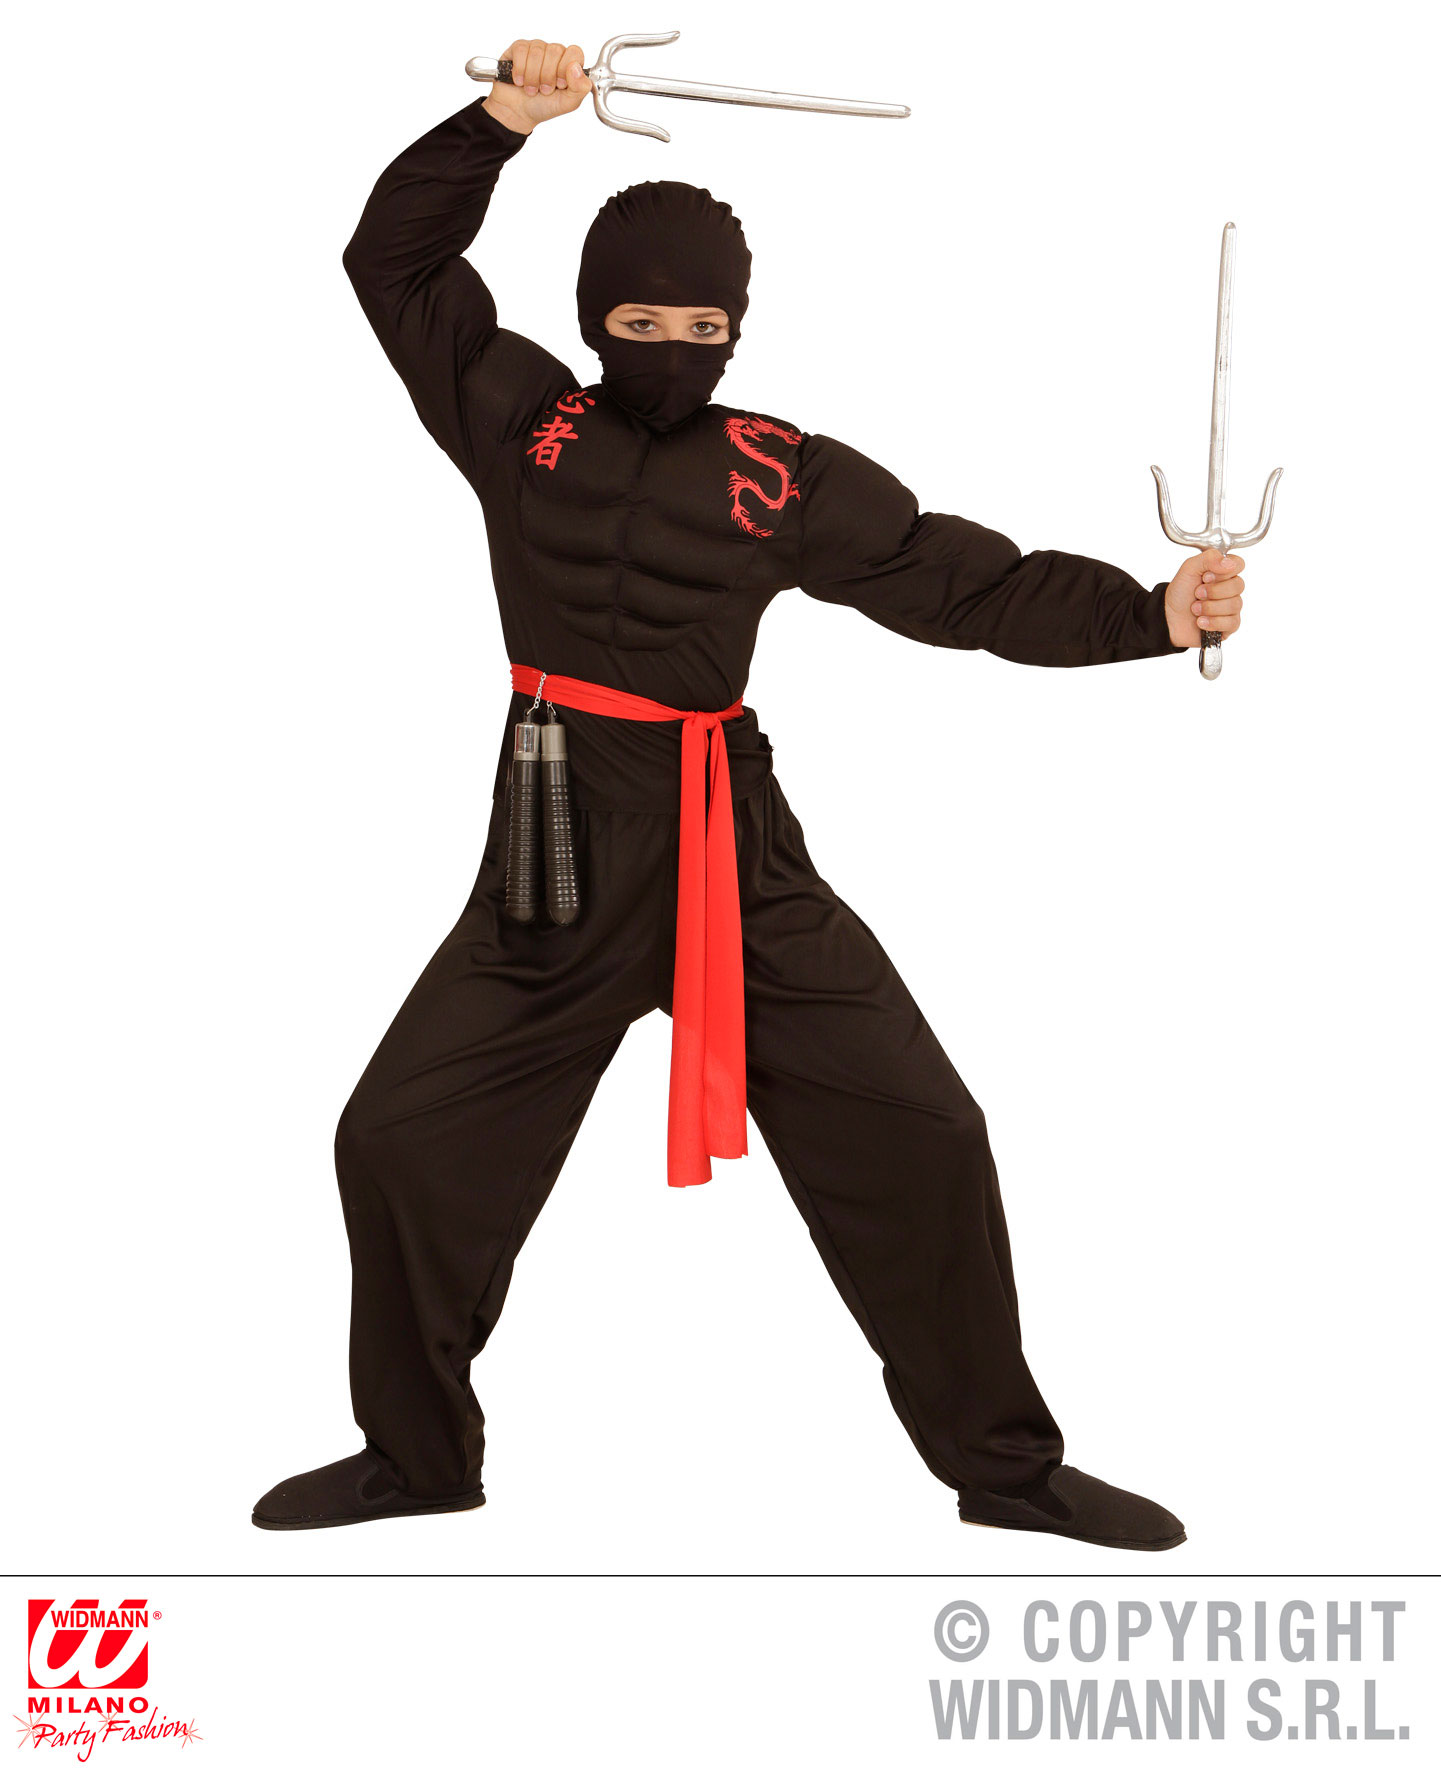 4 tlg. Ninja Kostüm, Samurai, rot schwarz, Muskelshirt Kinder Karneval